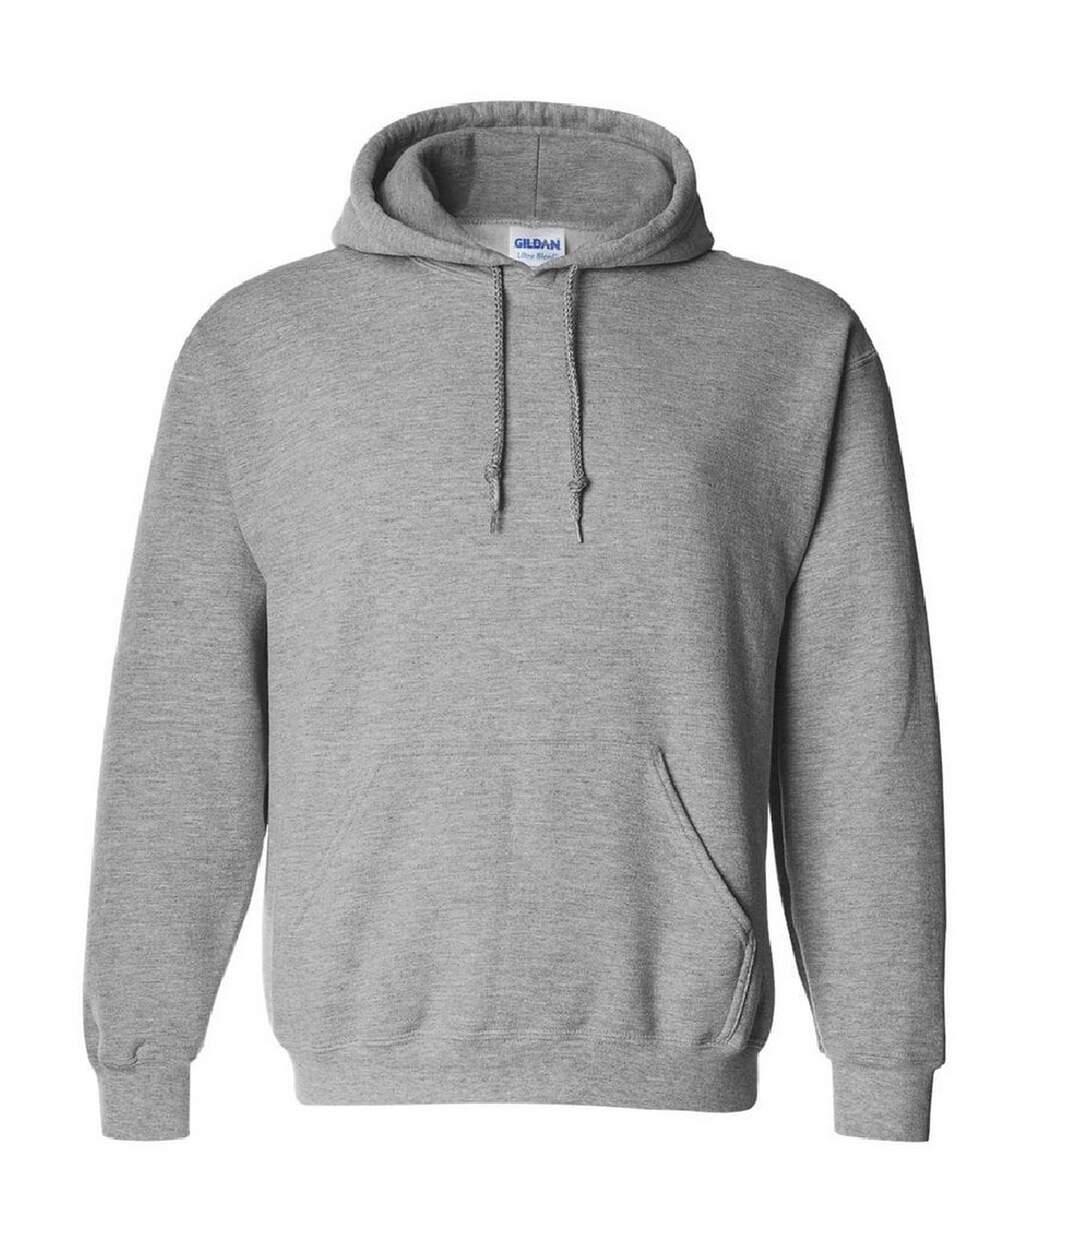 Gildan Heavyweight DryBlend Adult Unisex Hooded Sweatshirt Top / Hoodie (13 Colours) (Sport Grey) - UTBC461